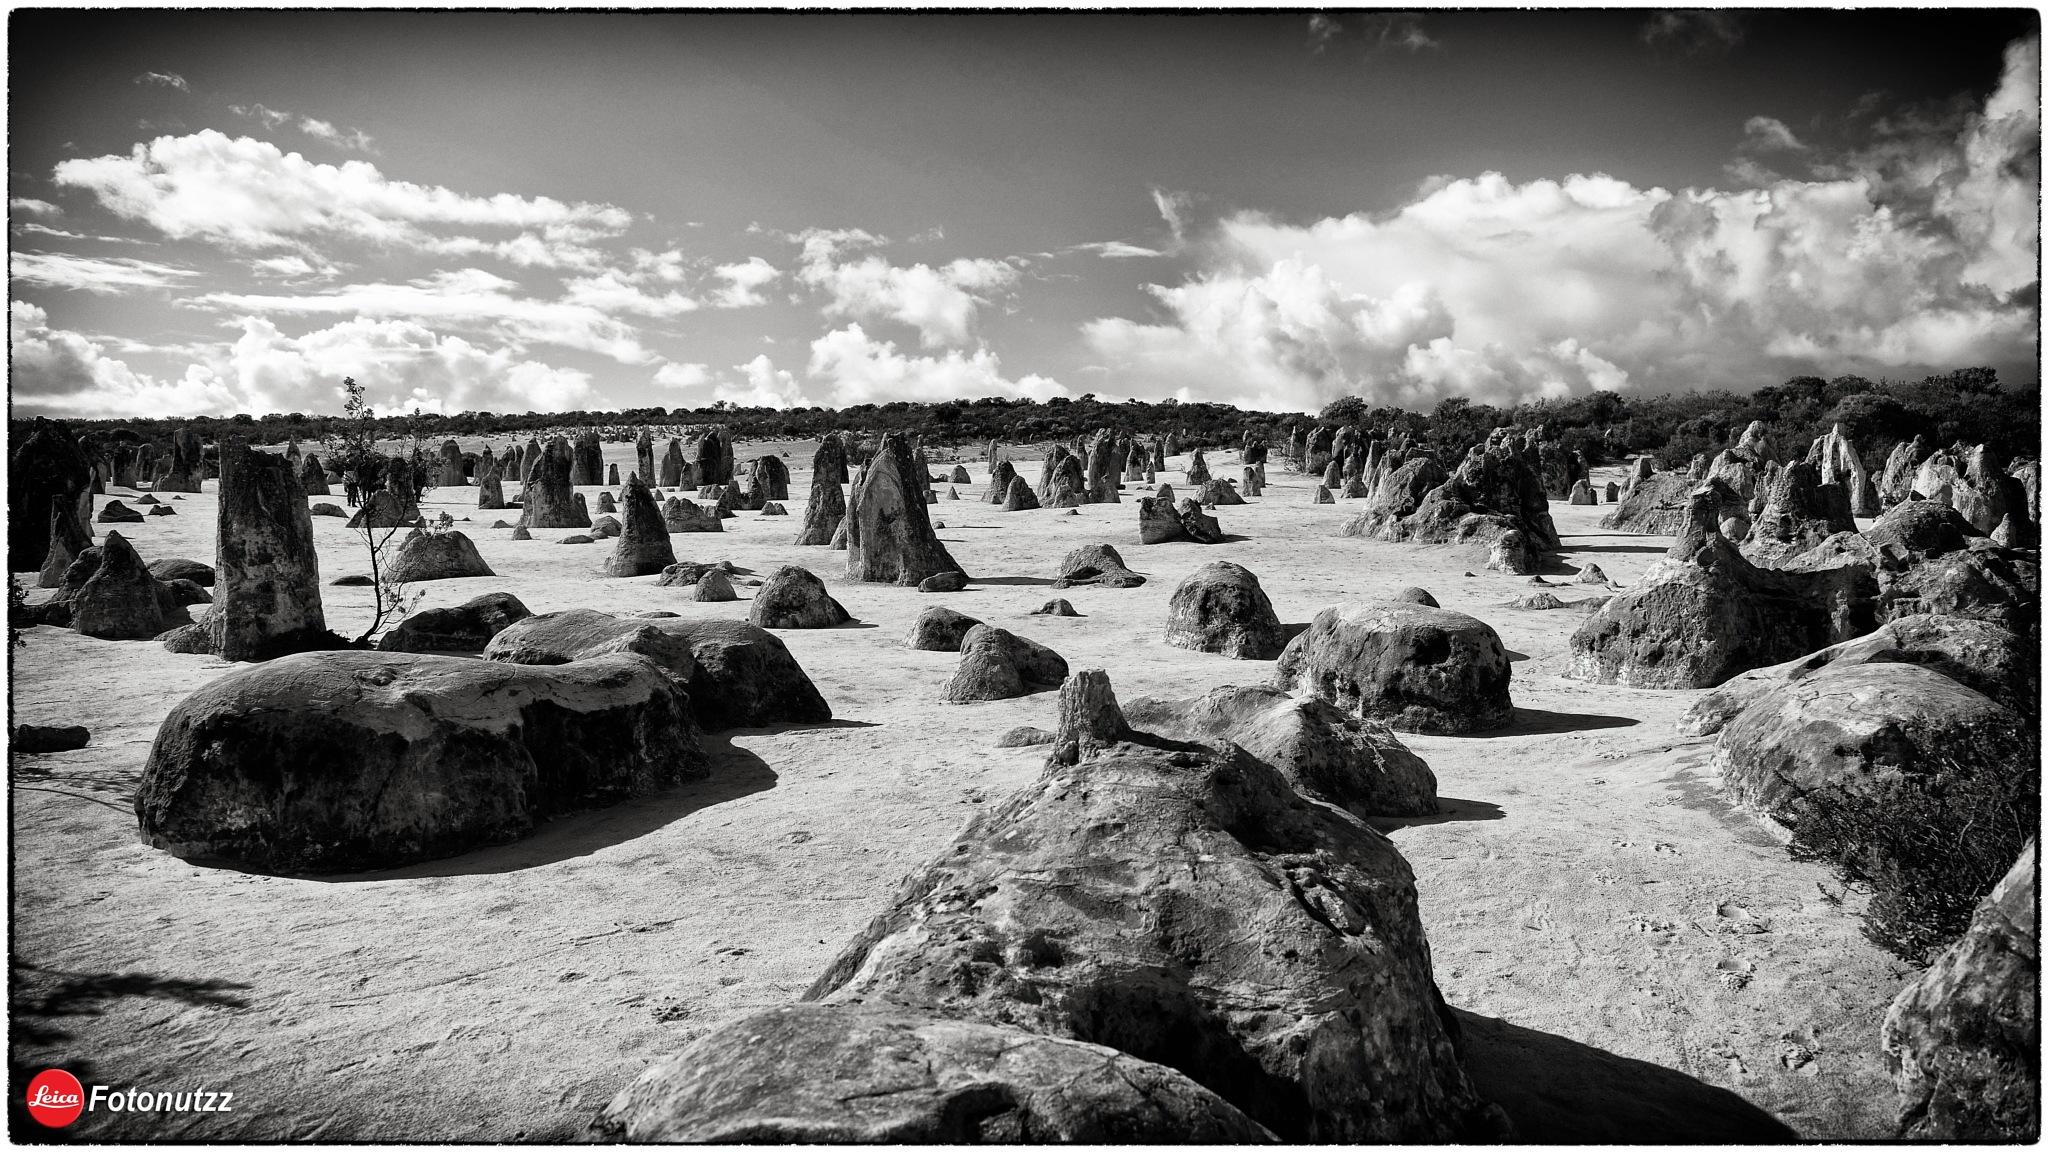 The Pinnacle @ Perth by Fotonutzz